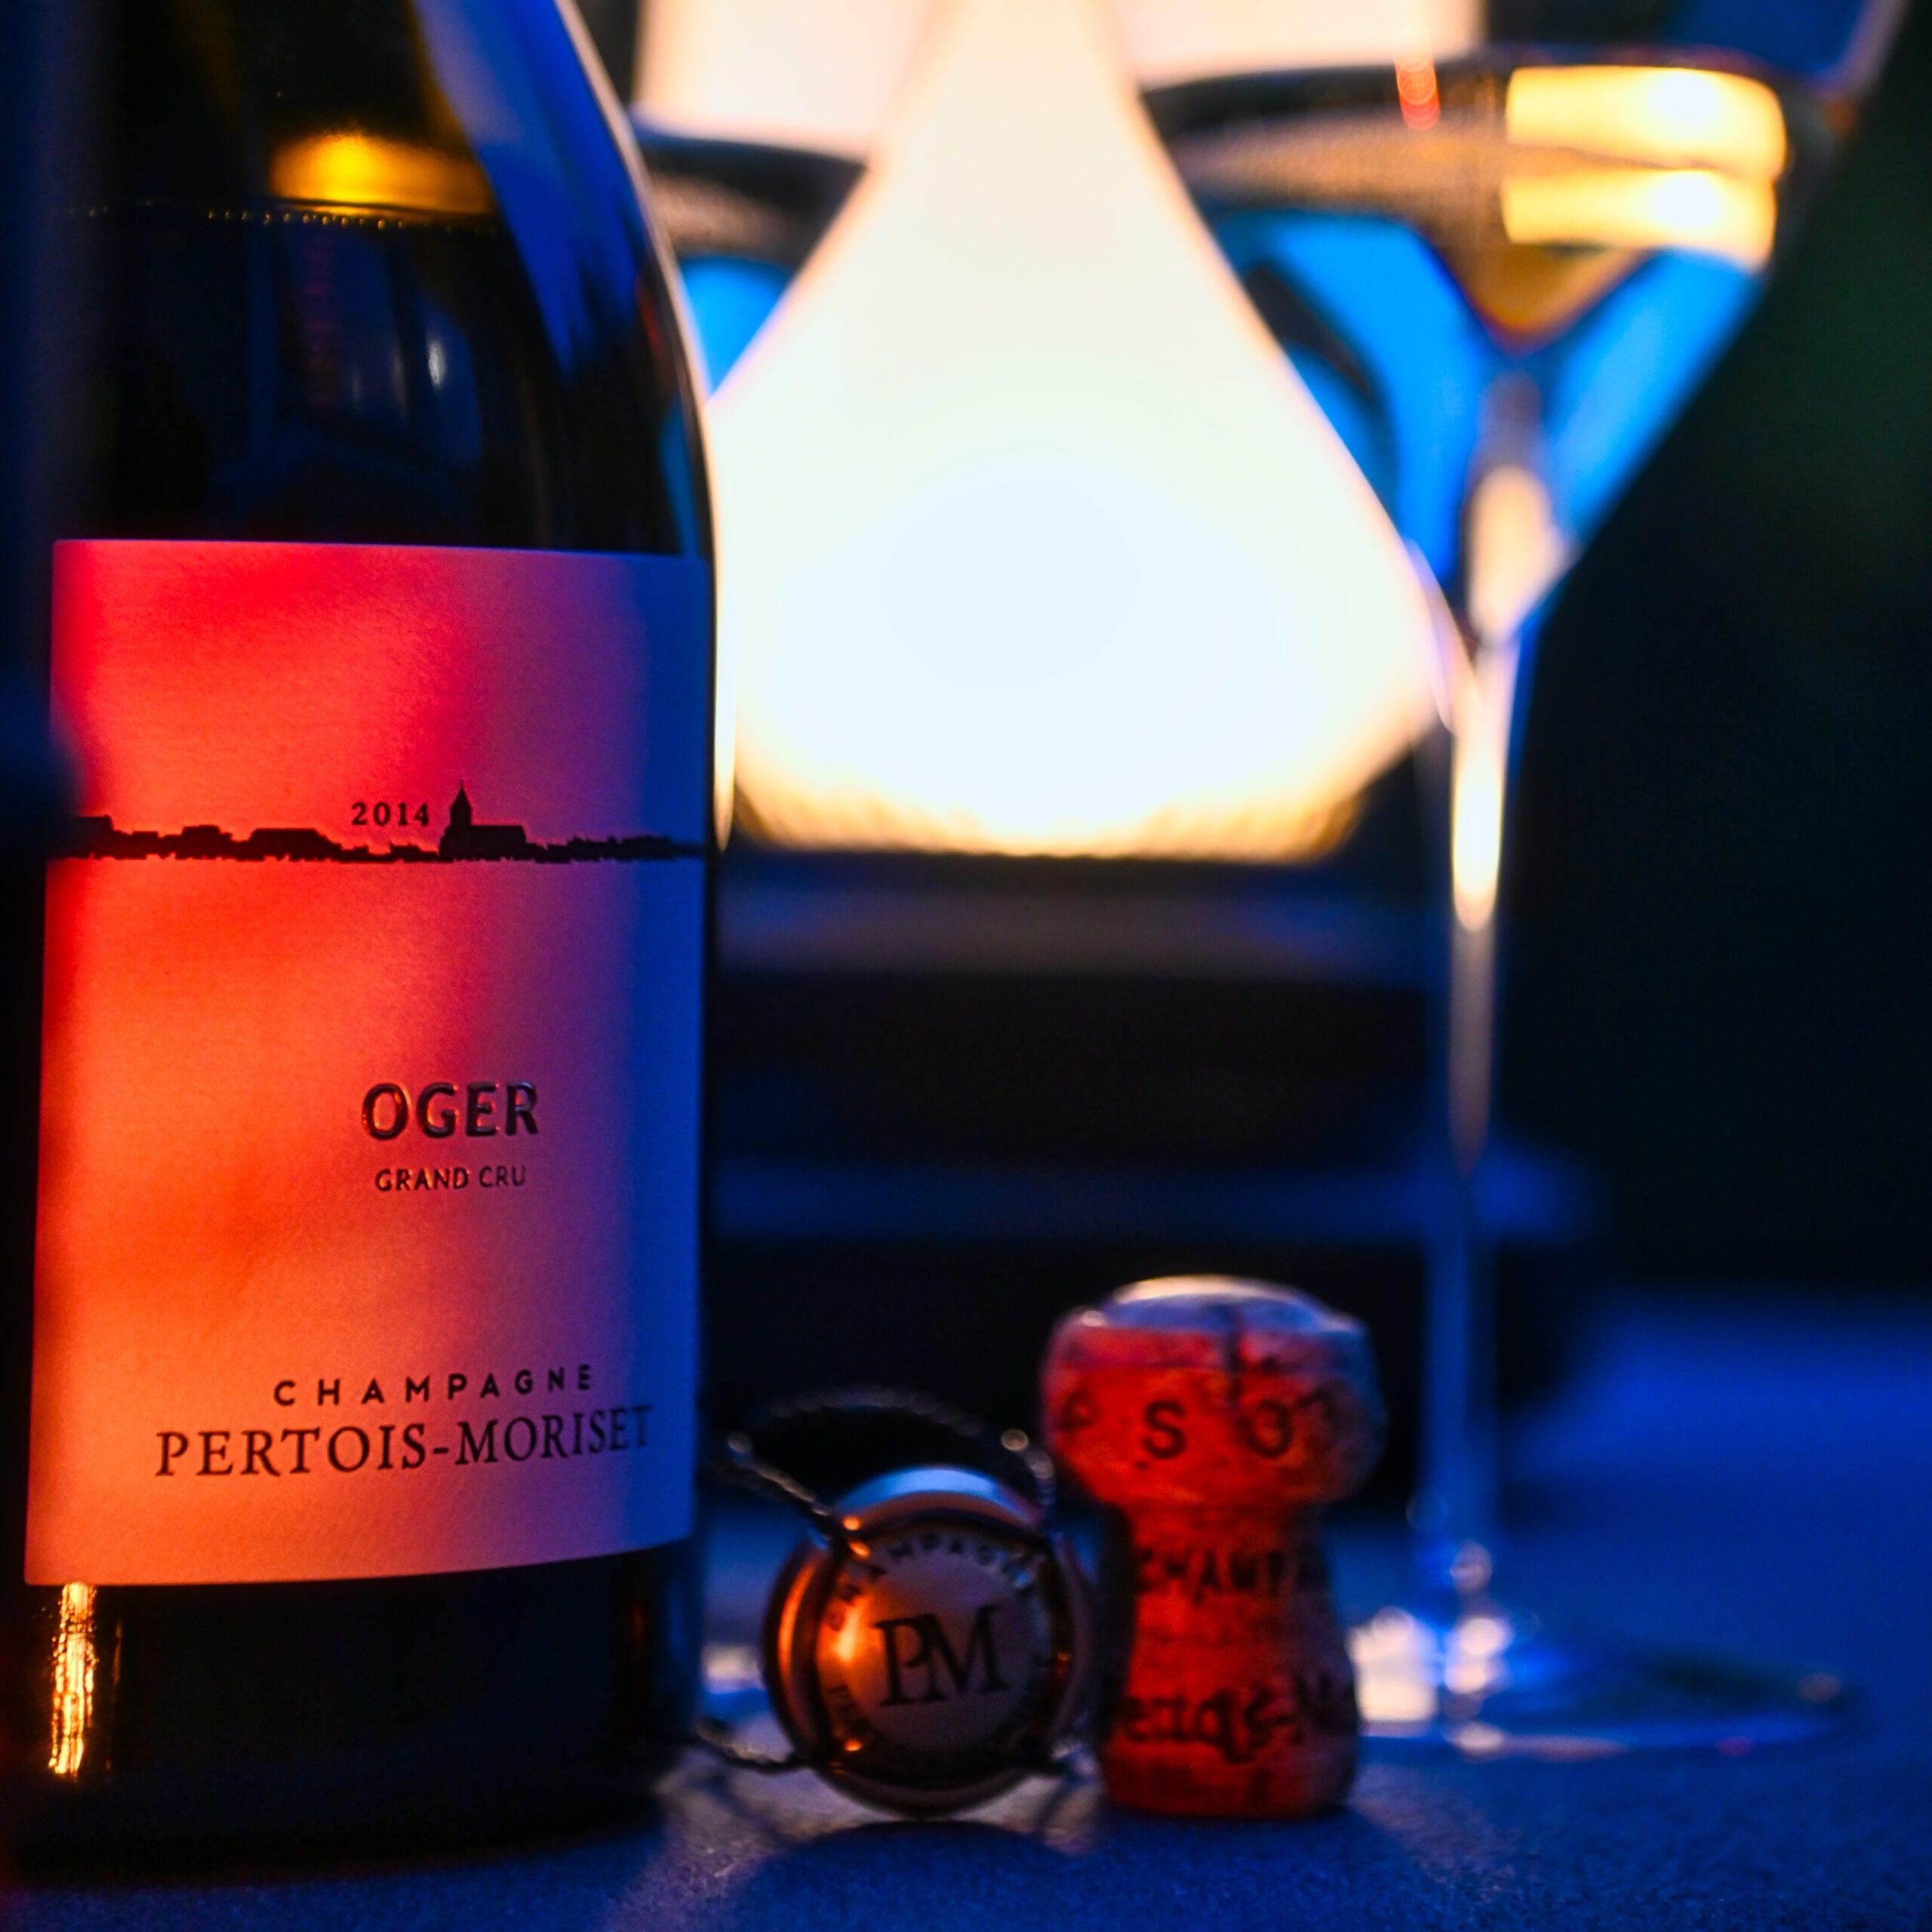 Pertois-Moriset Oger Grand Cru Extra Brut 2014